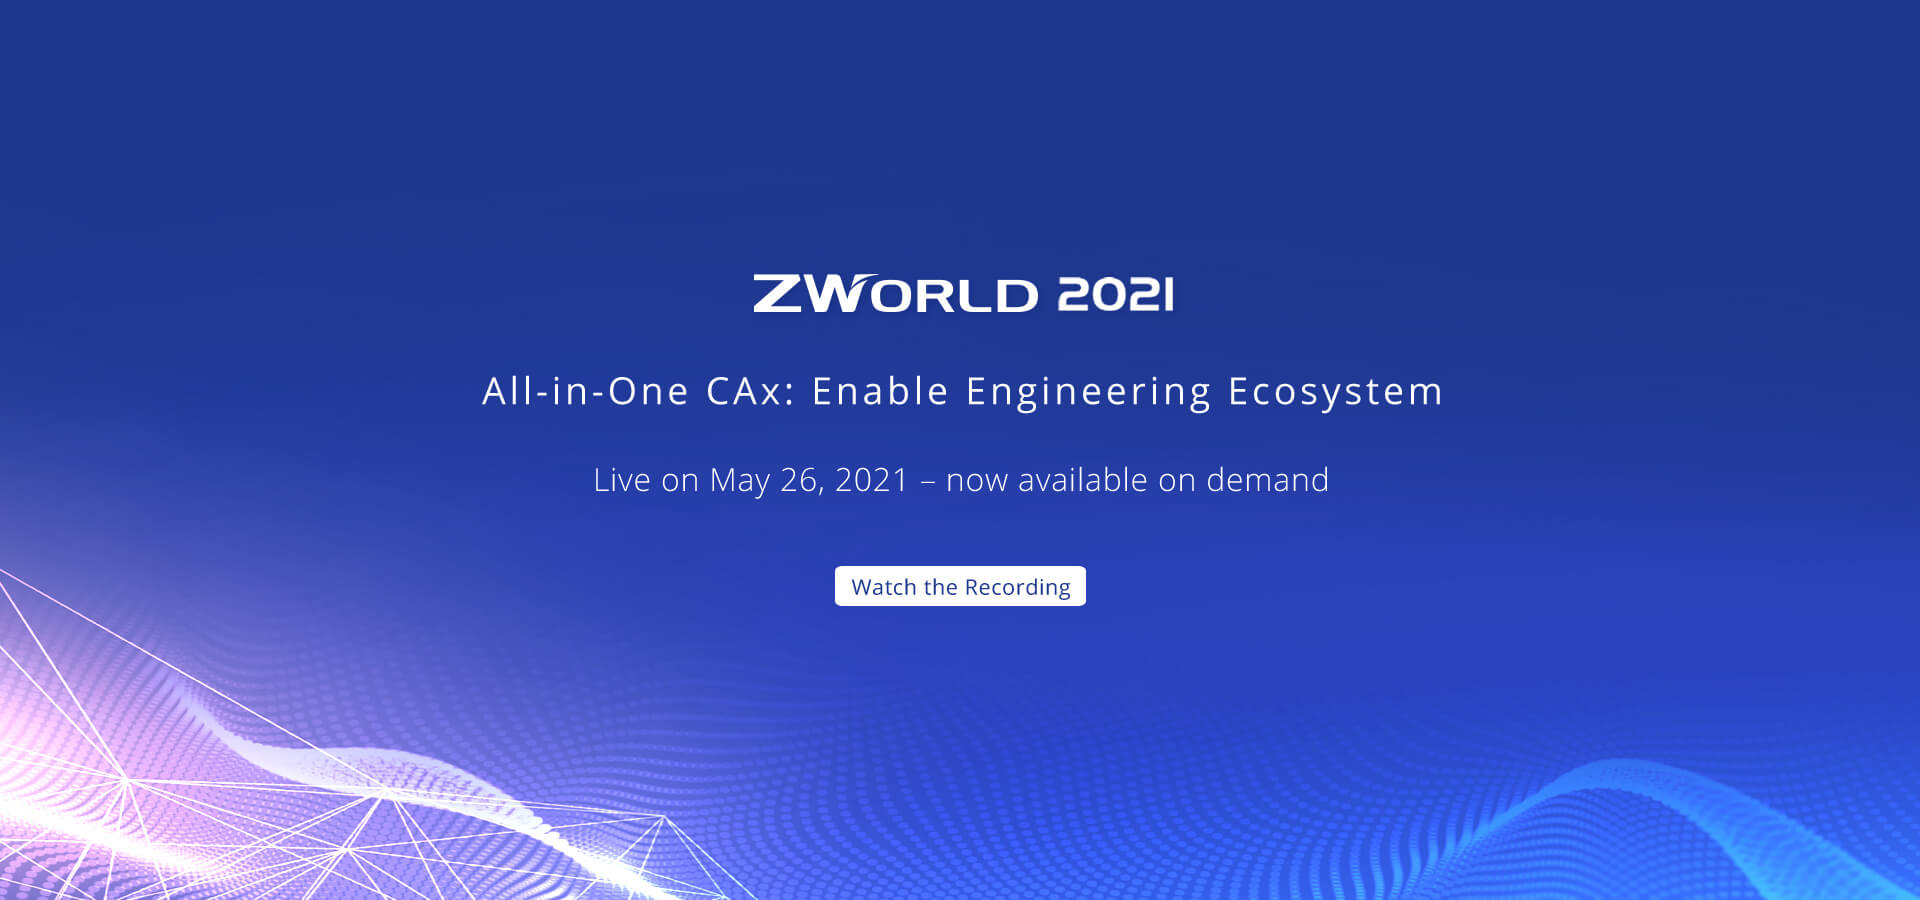 ZWorld 2021